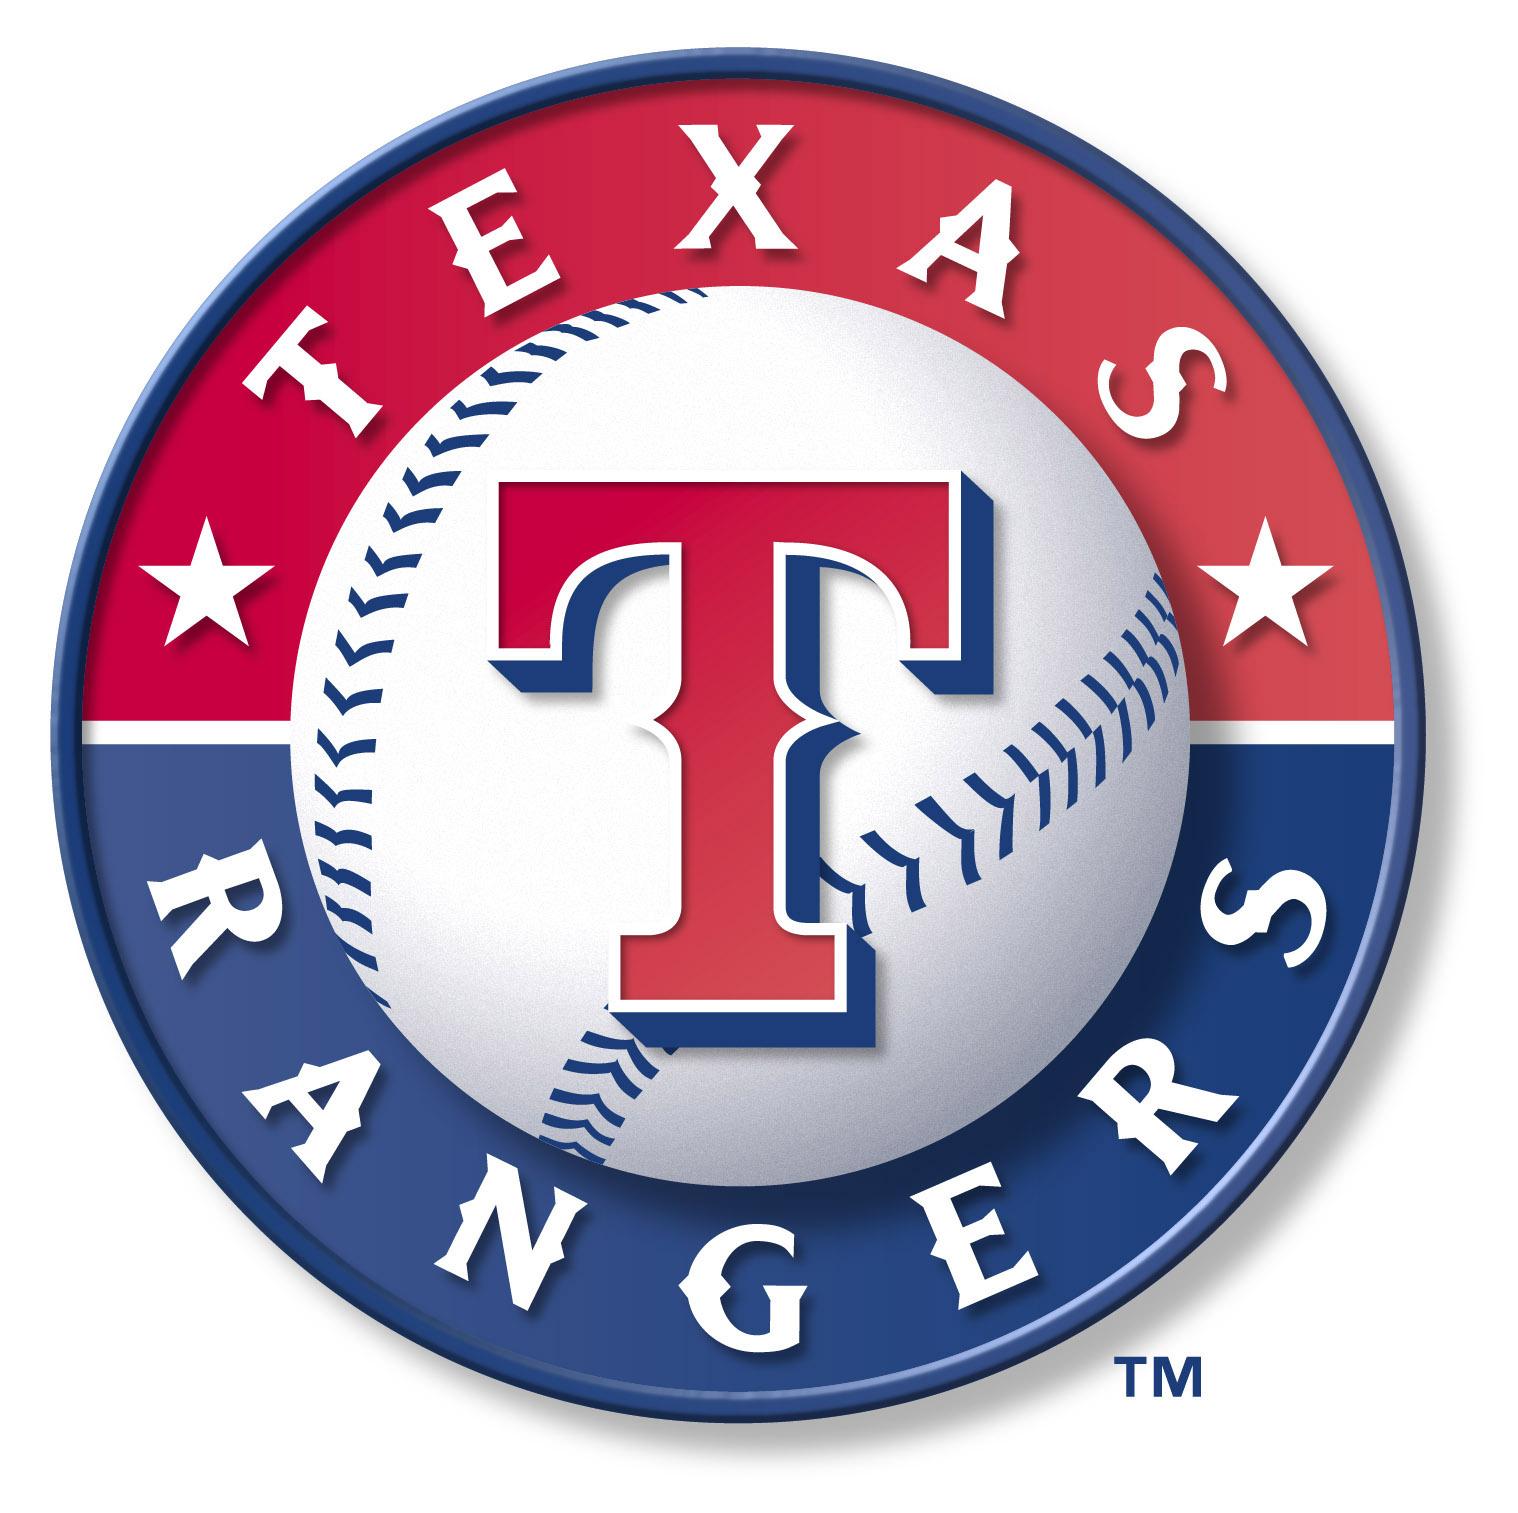 Texas rangers payroll in 2013 rangers organizational - Texas rangers logo images ...